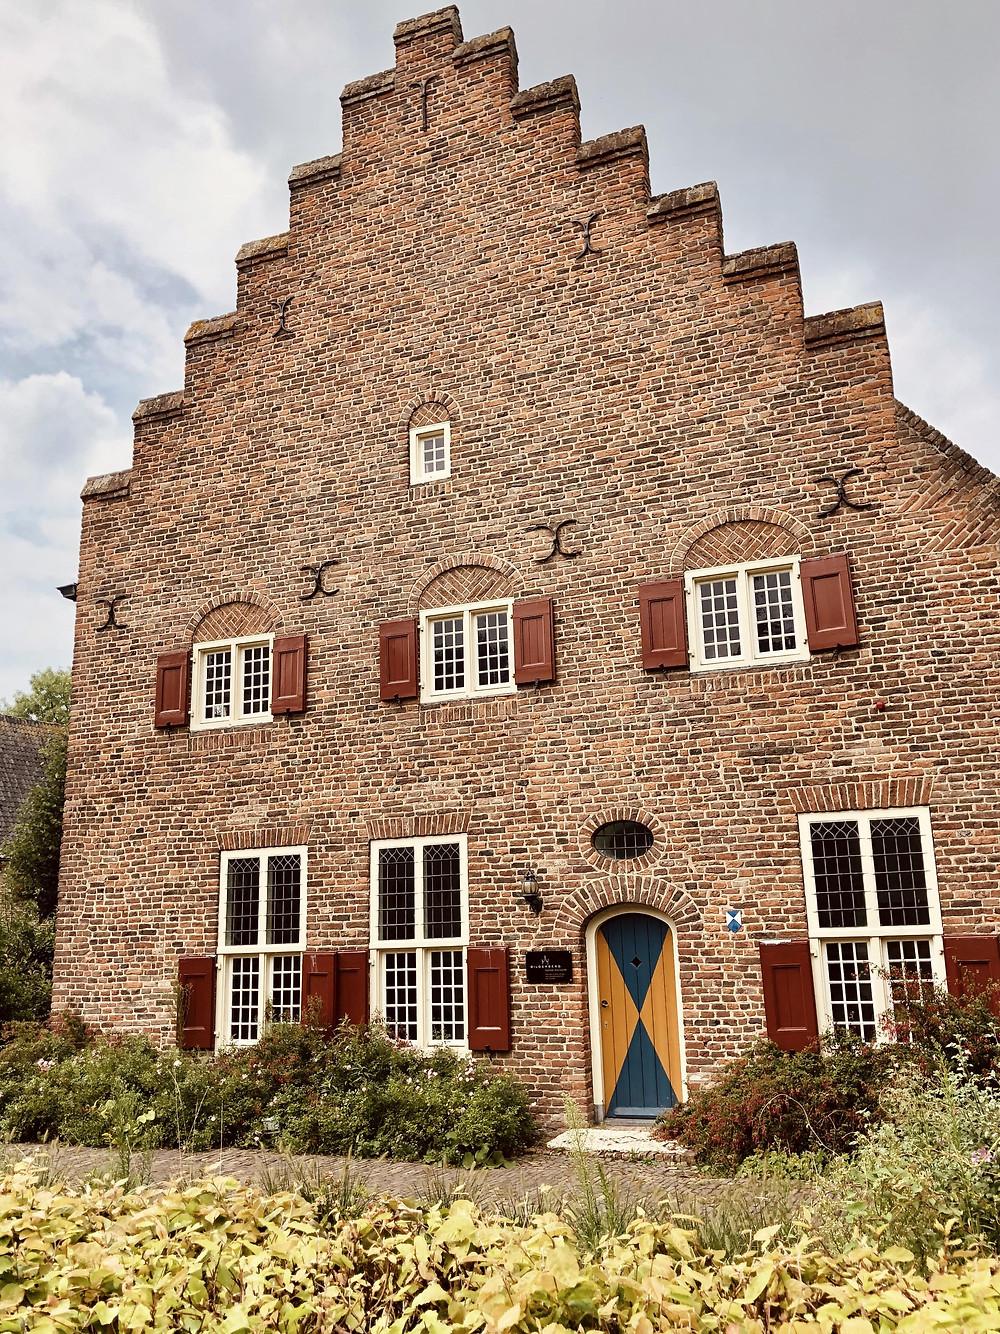 Bilderberg event location Doorwerth castle-the Netherlands